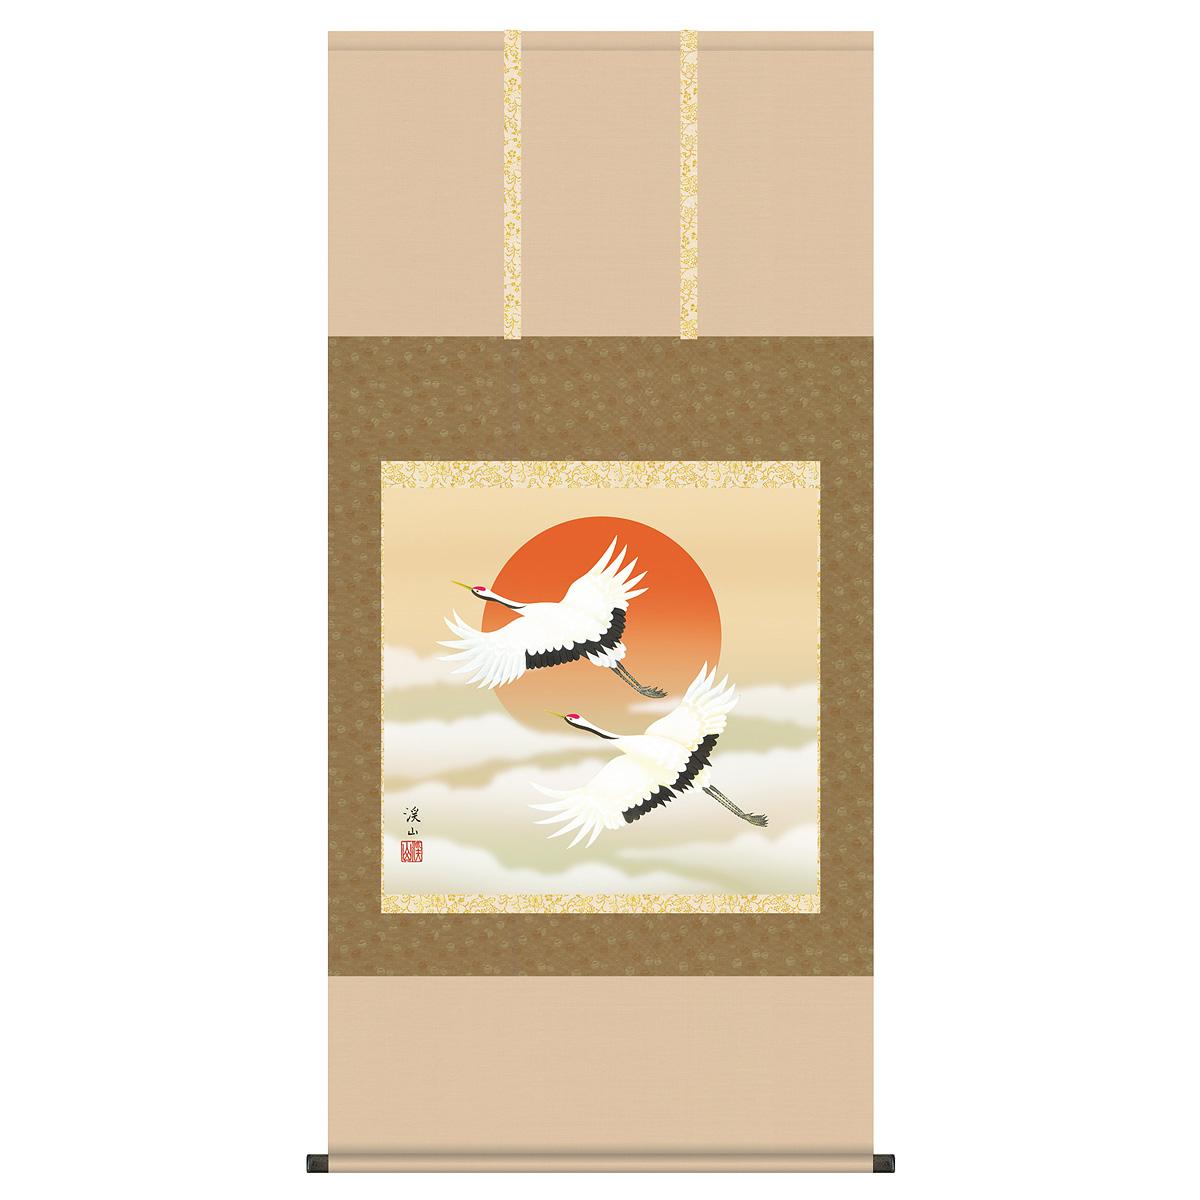 端午の節句 正月 掛け軸 掛軸 「伊藤渓山(三美会)作 旭日飛翔」 ●正月飾り 端午の節句